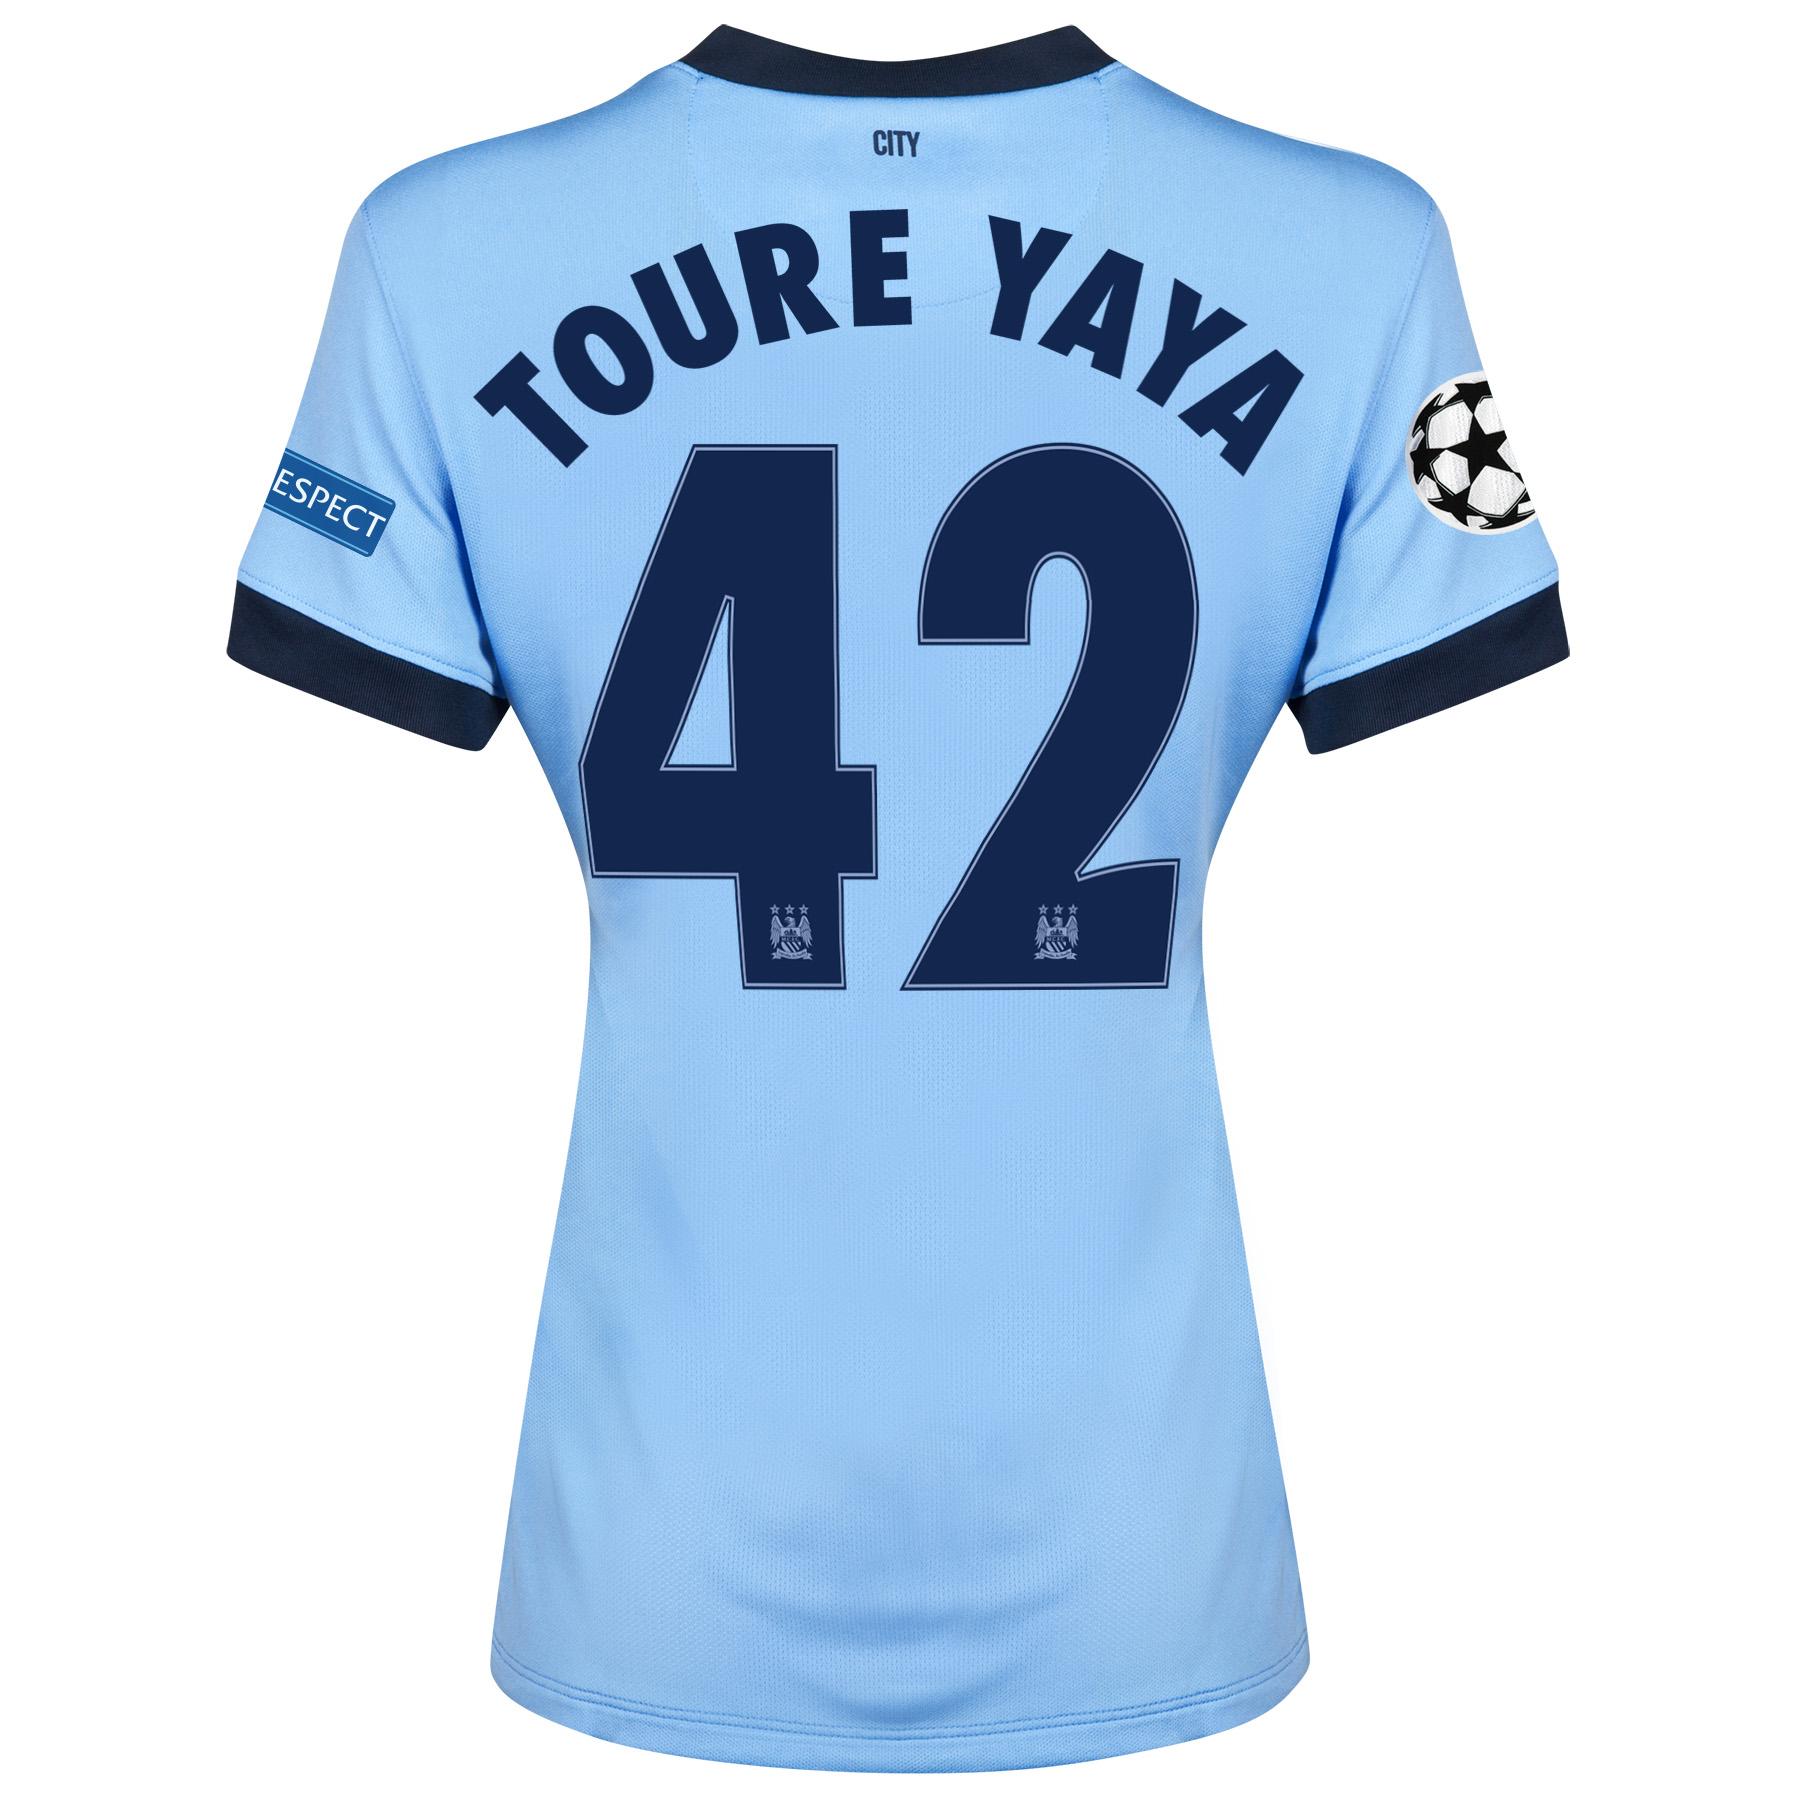 Manchester City UEFA Champions League Home Shirt 2014/15 - Womens Sky Blue with Toure Yaya 42 printing